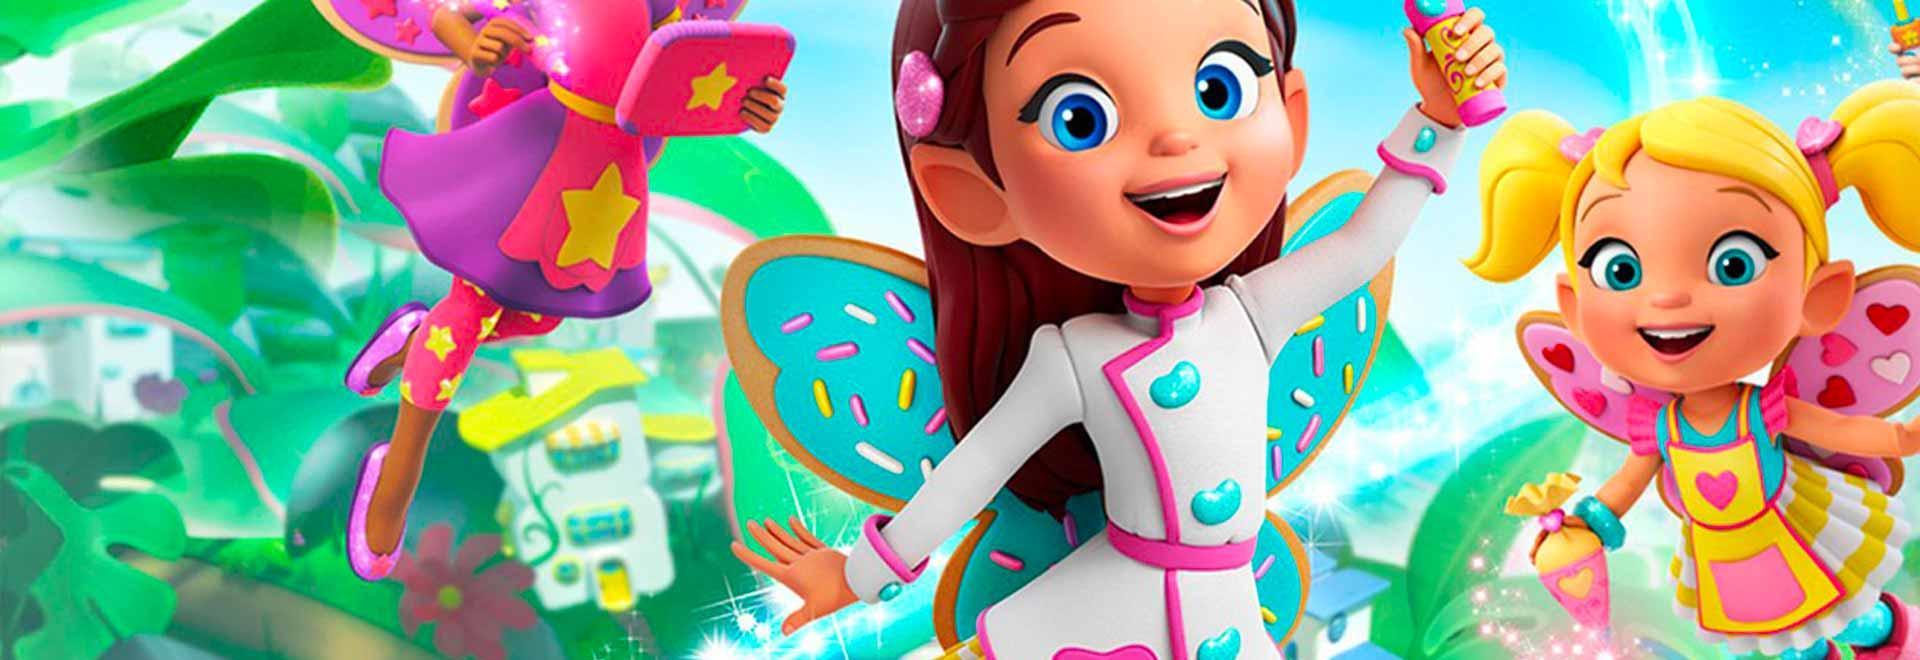 Poppy ballerina / Cricket va in campeggio!